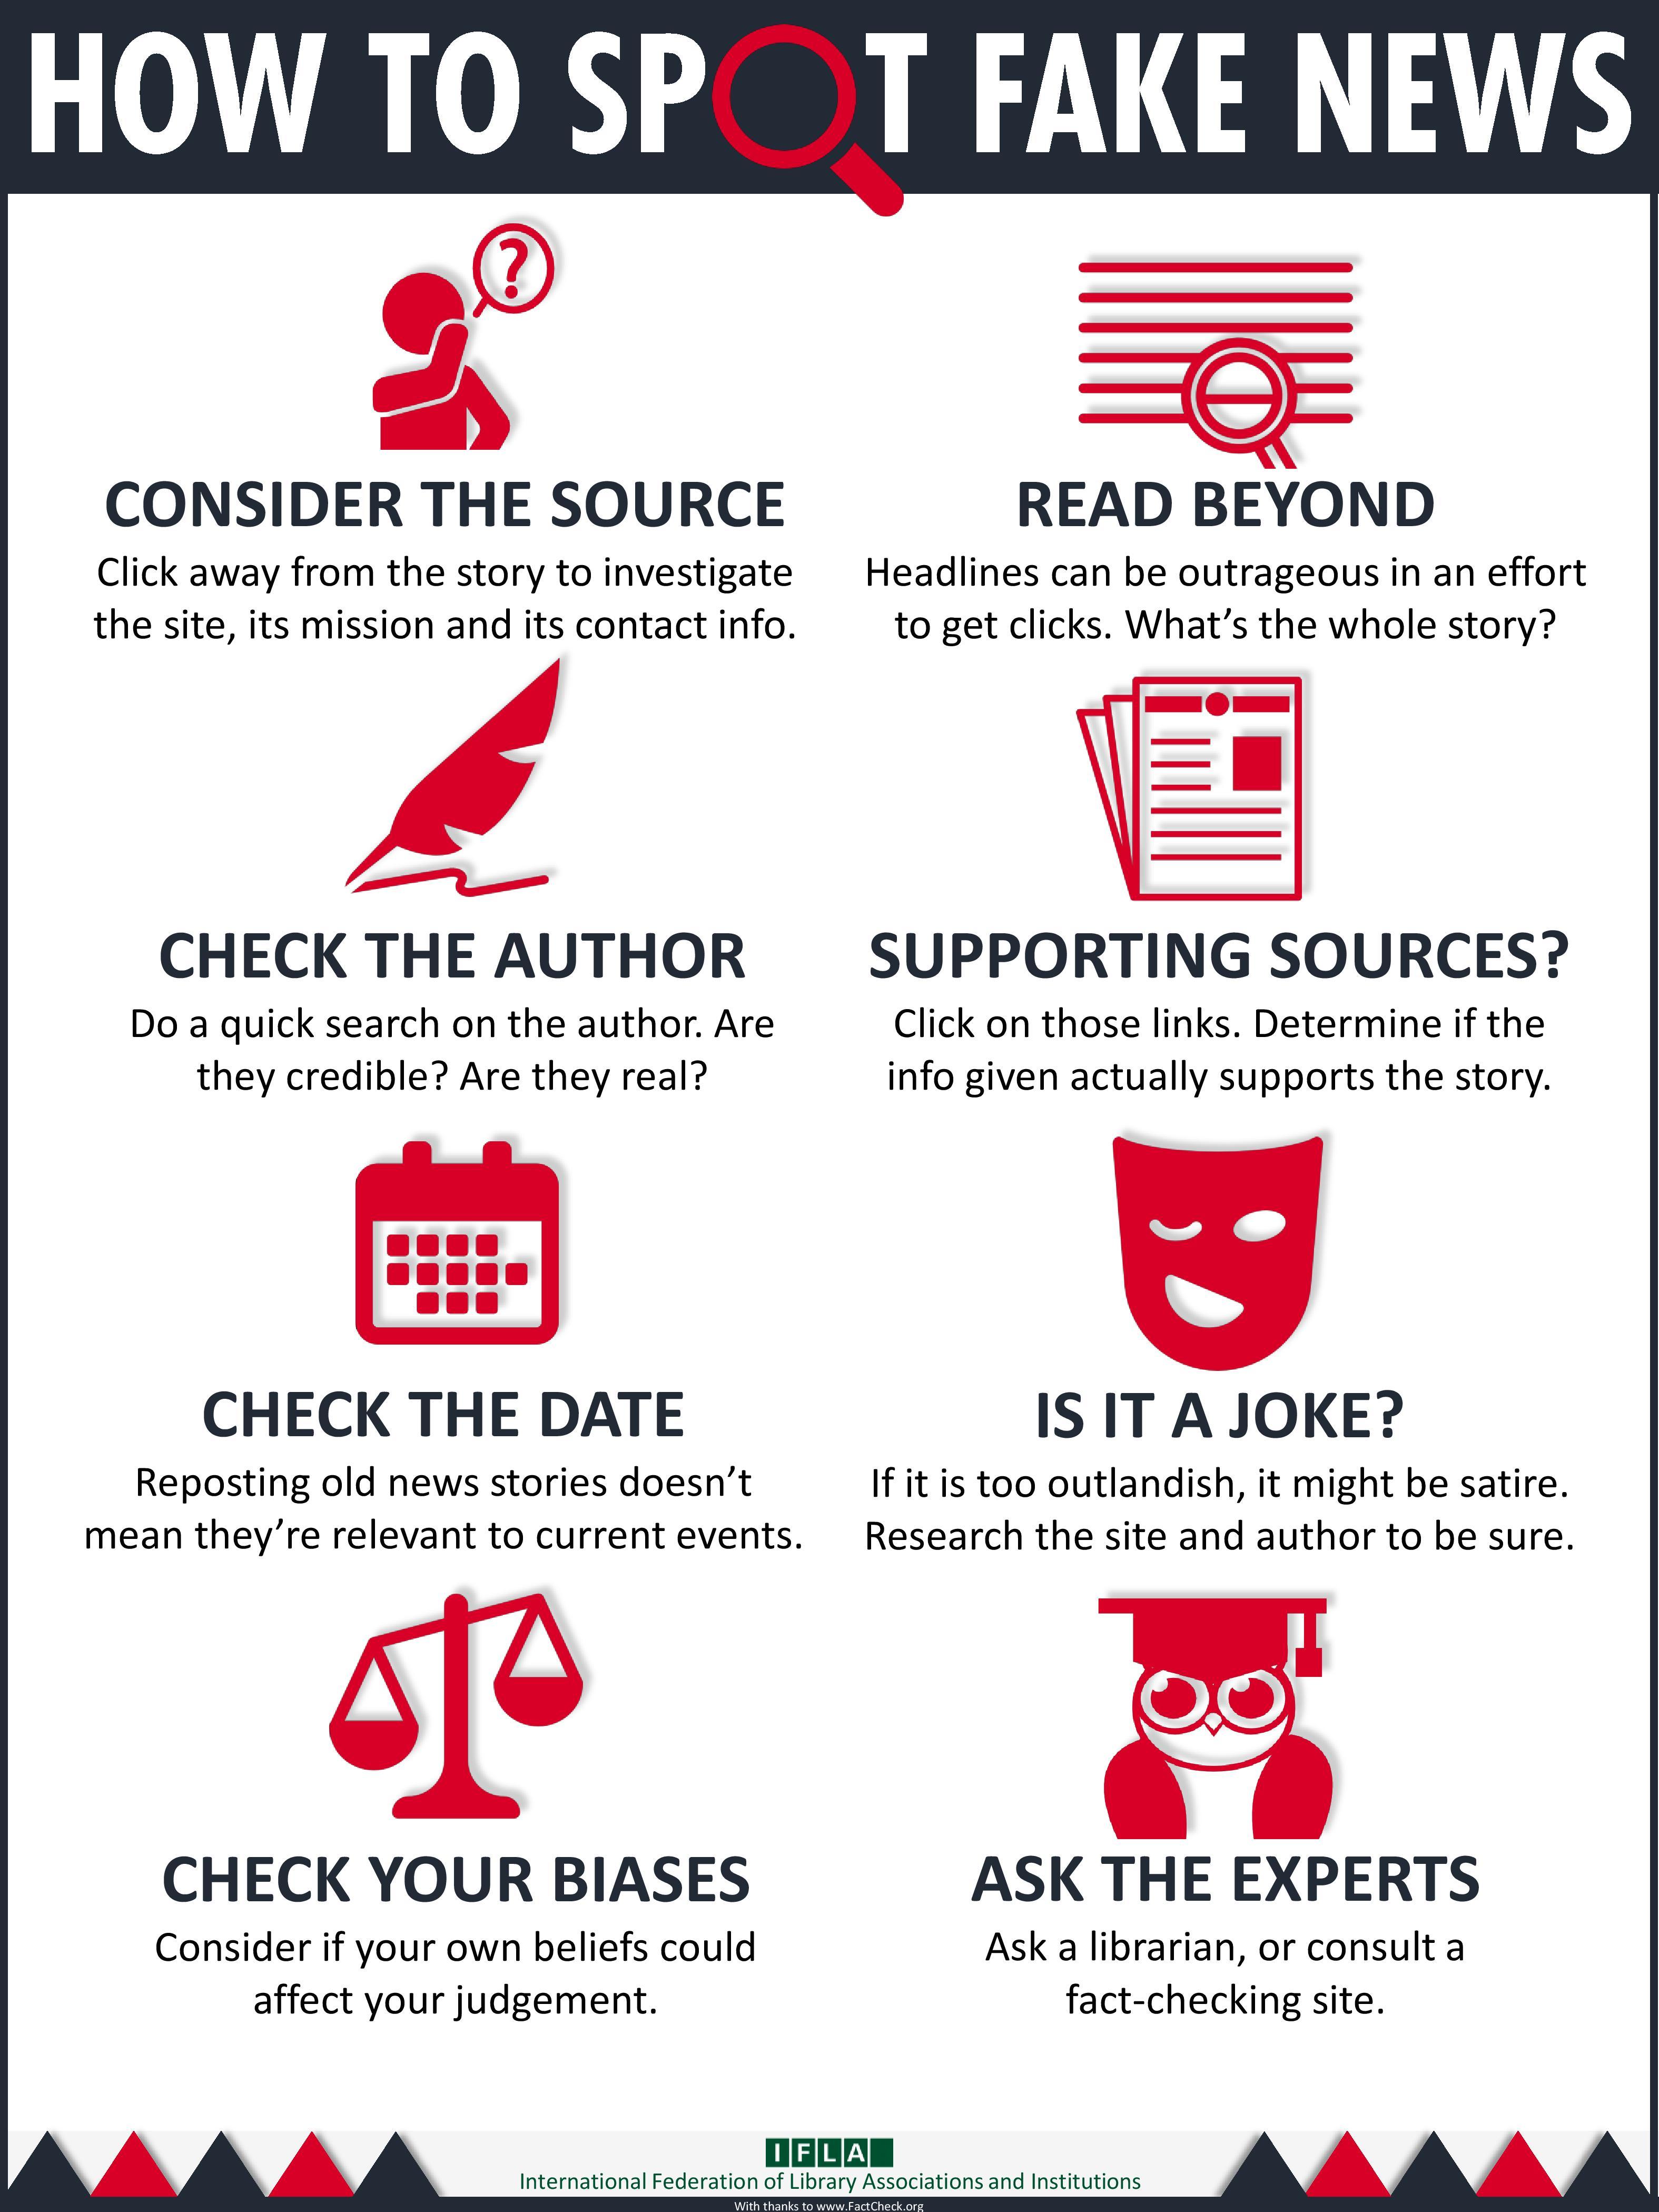 Ways to spot fake news infographic